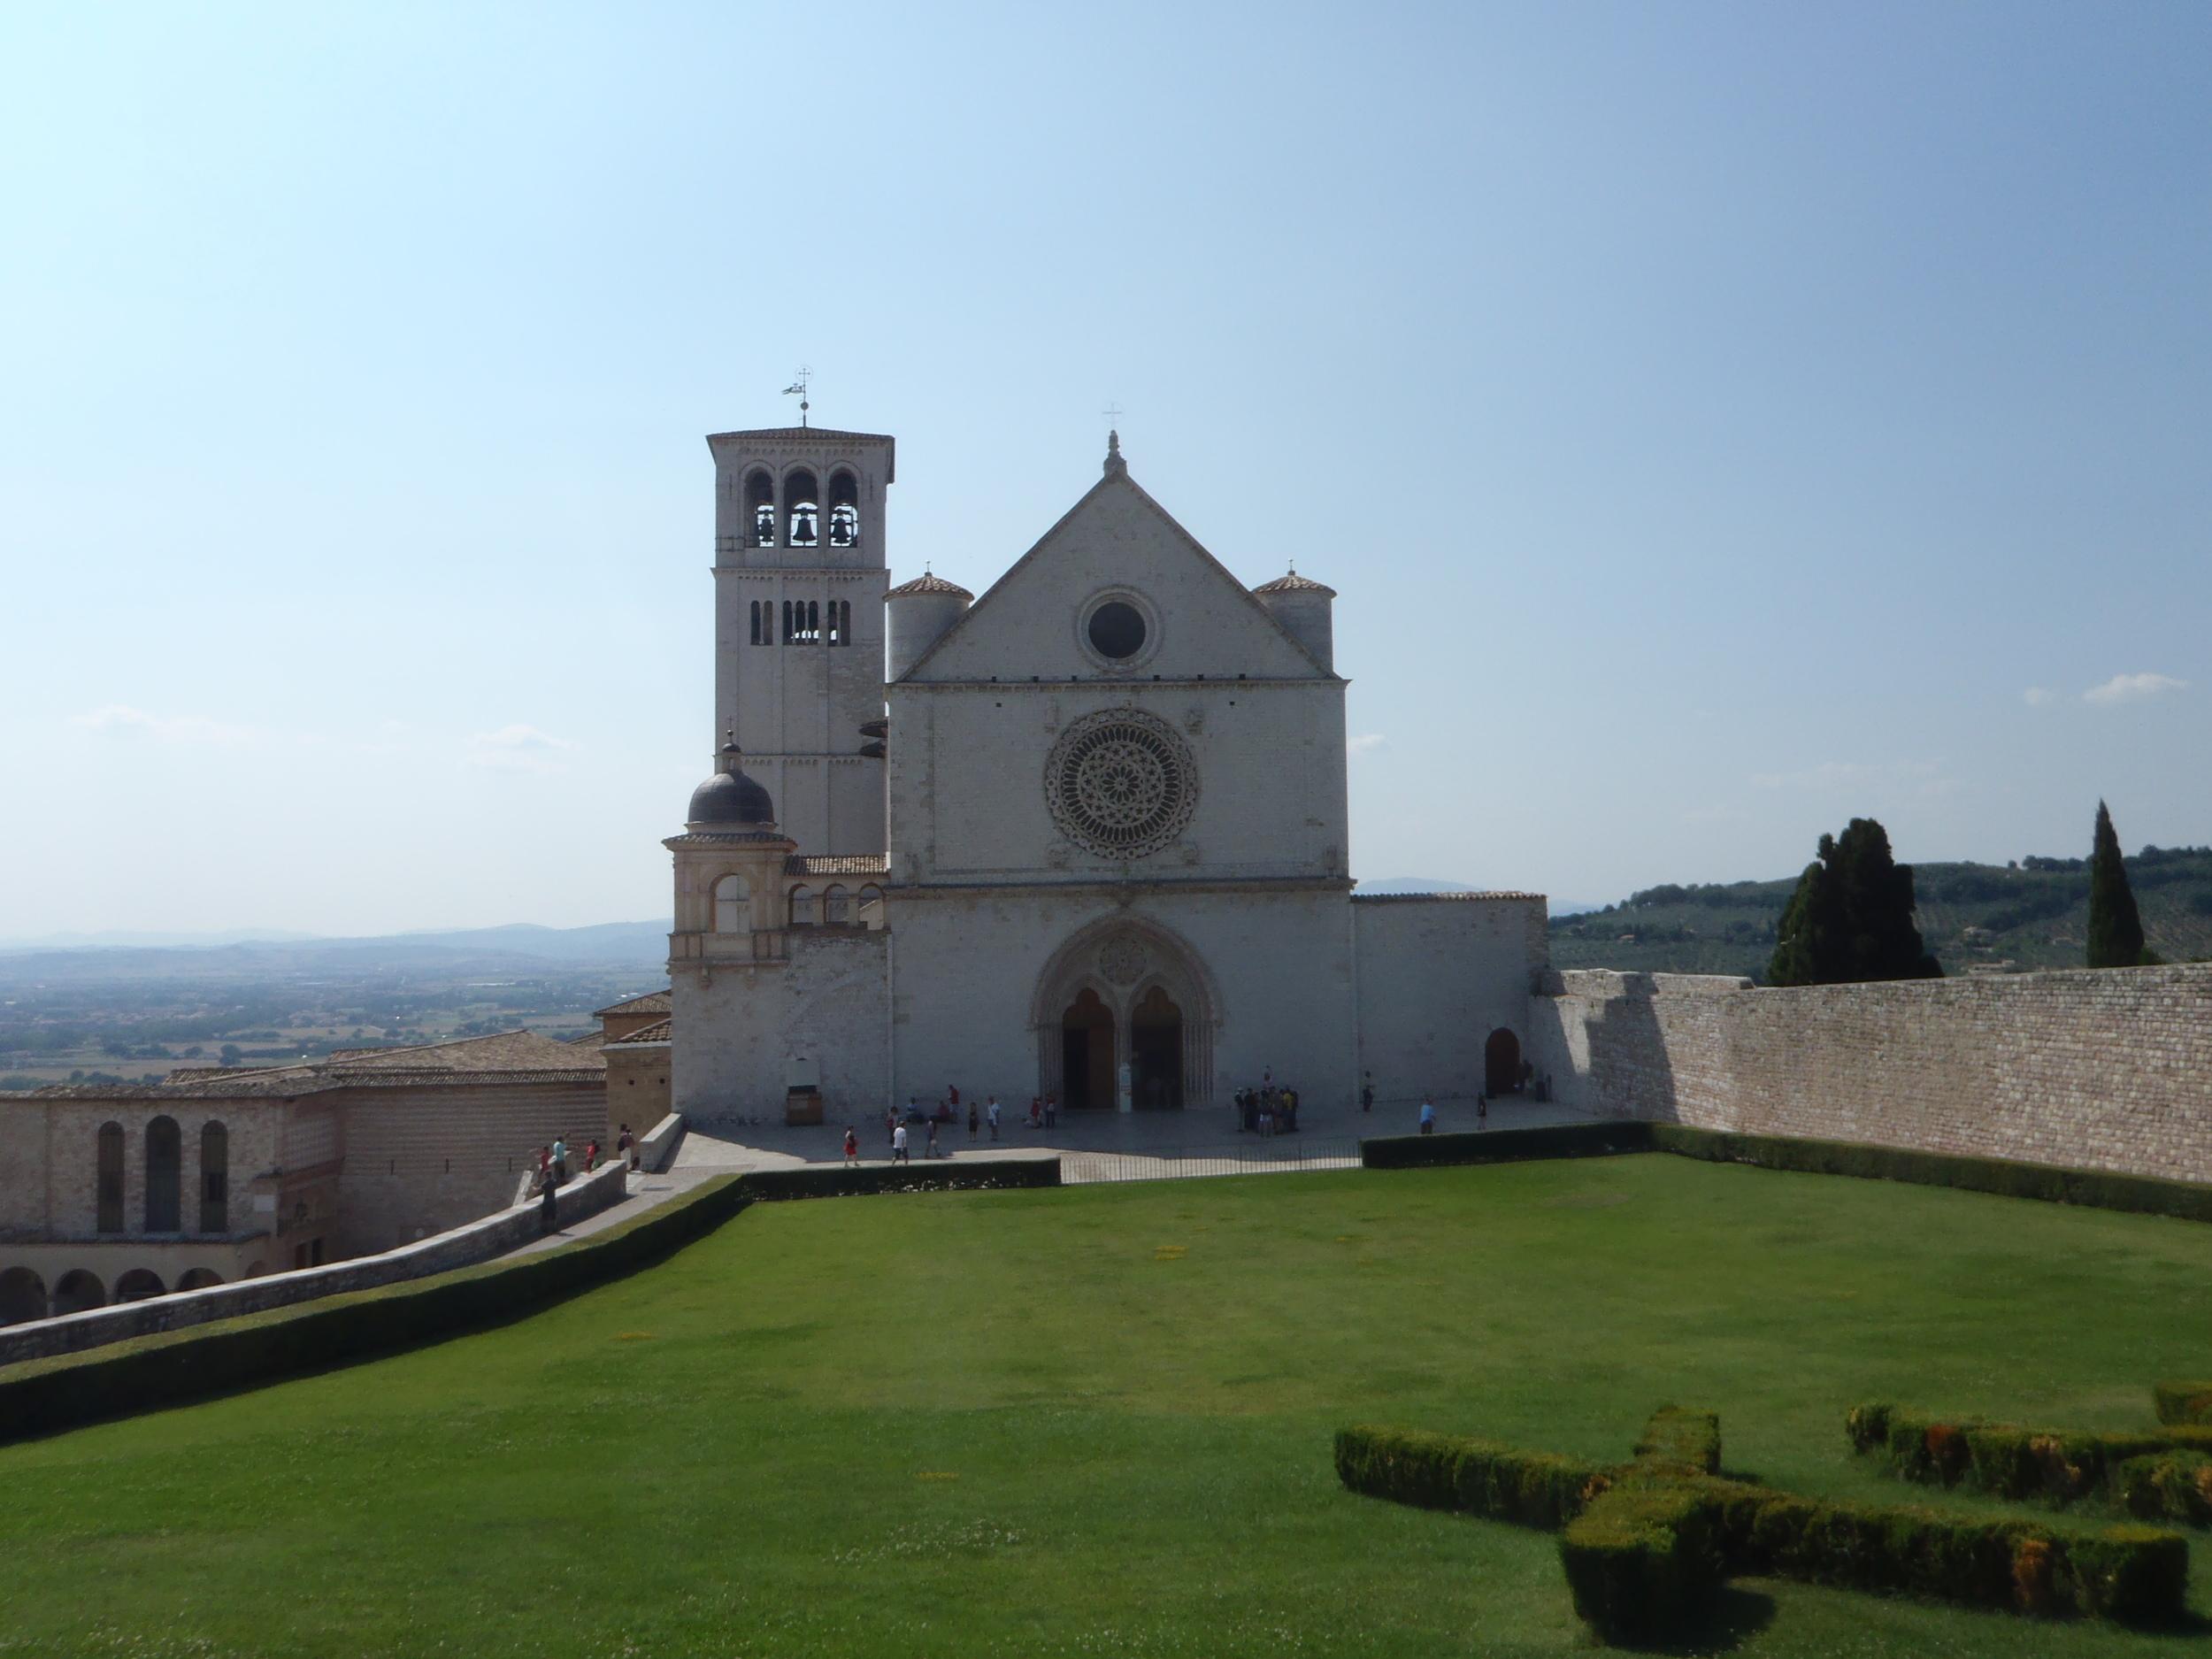 CRO Italy web 2013 - 021.JPG